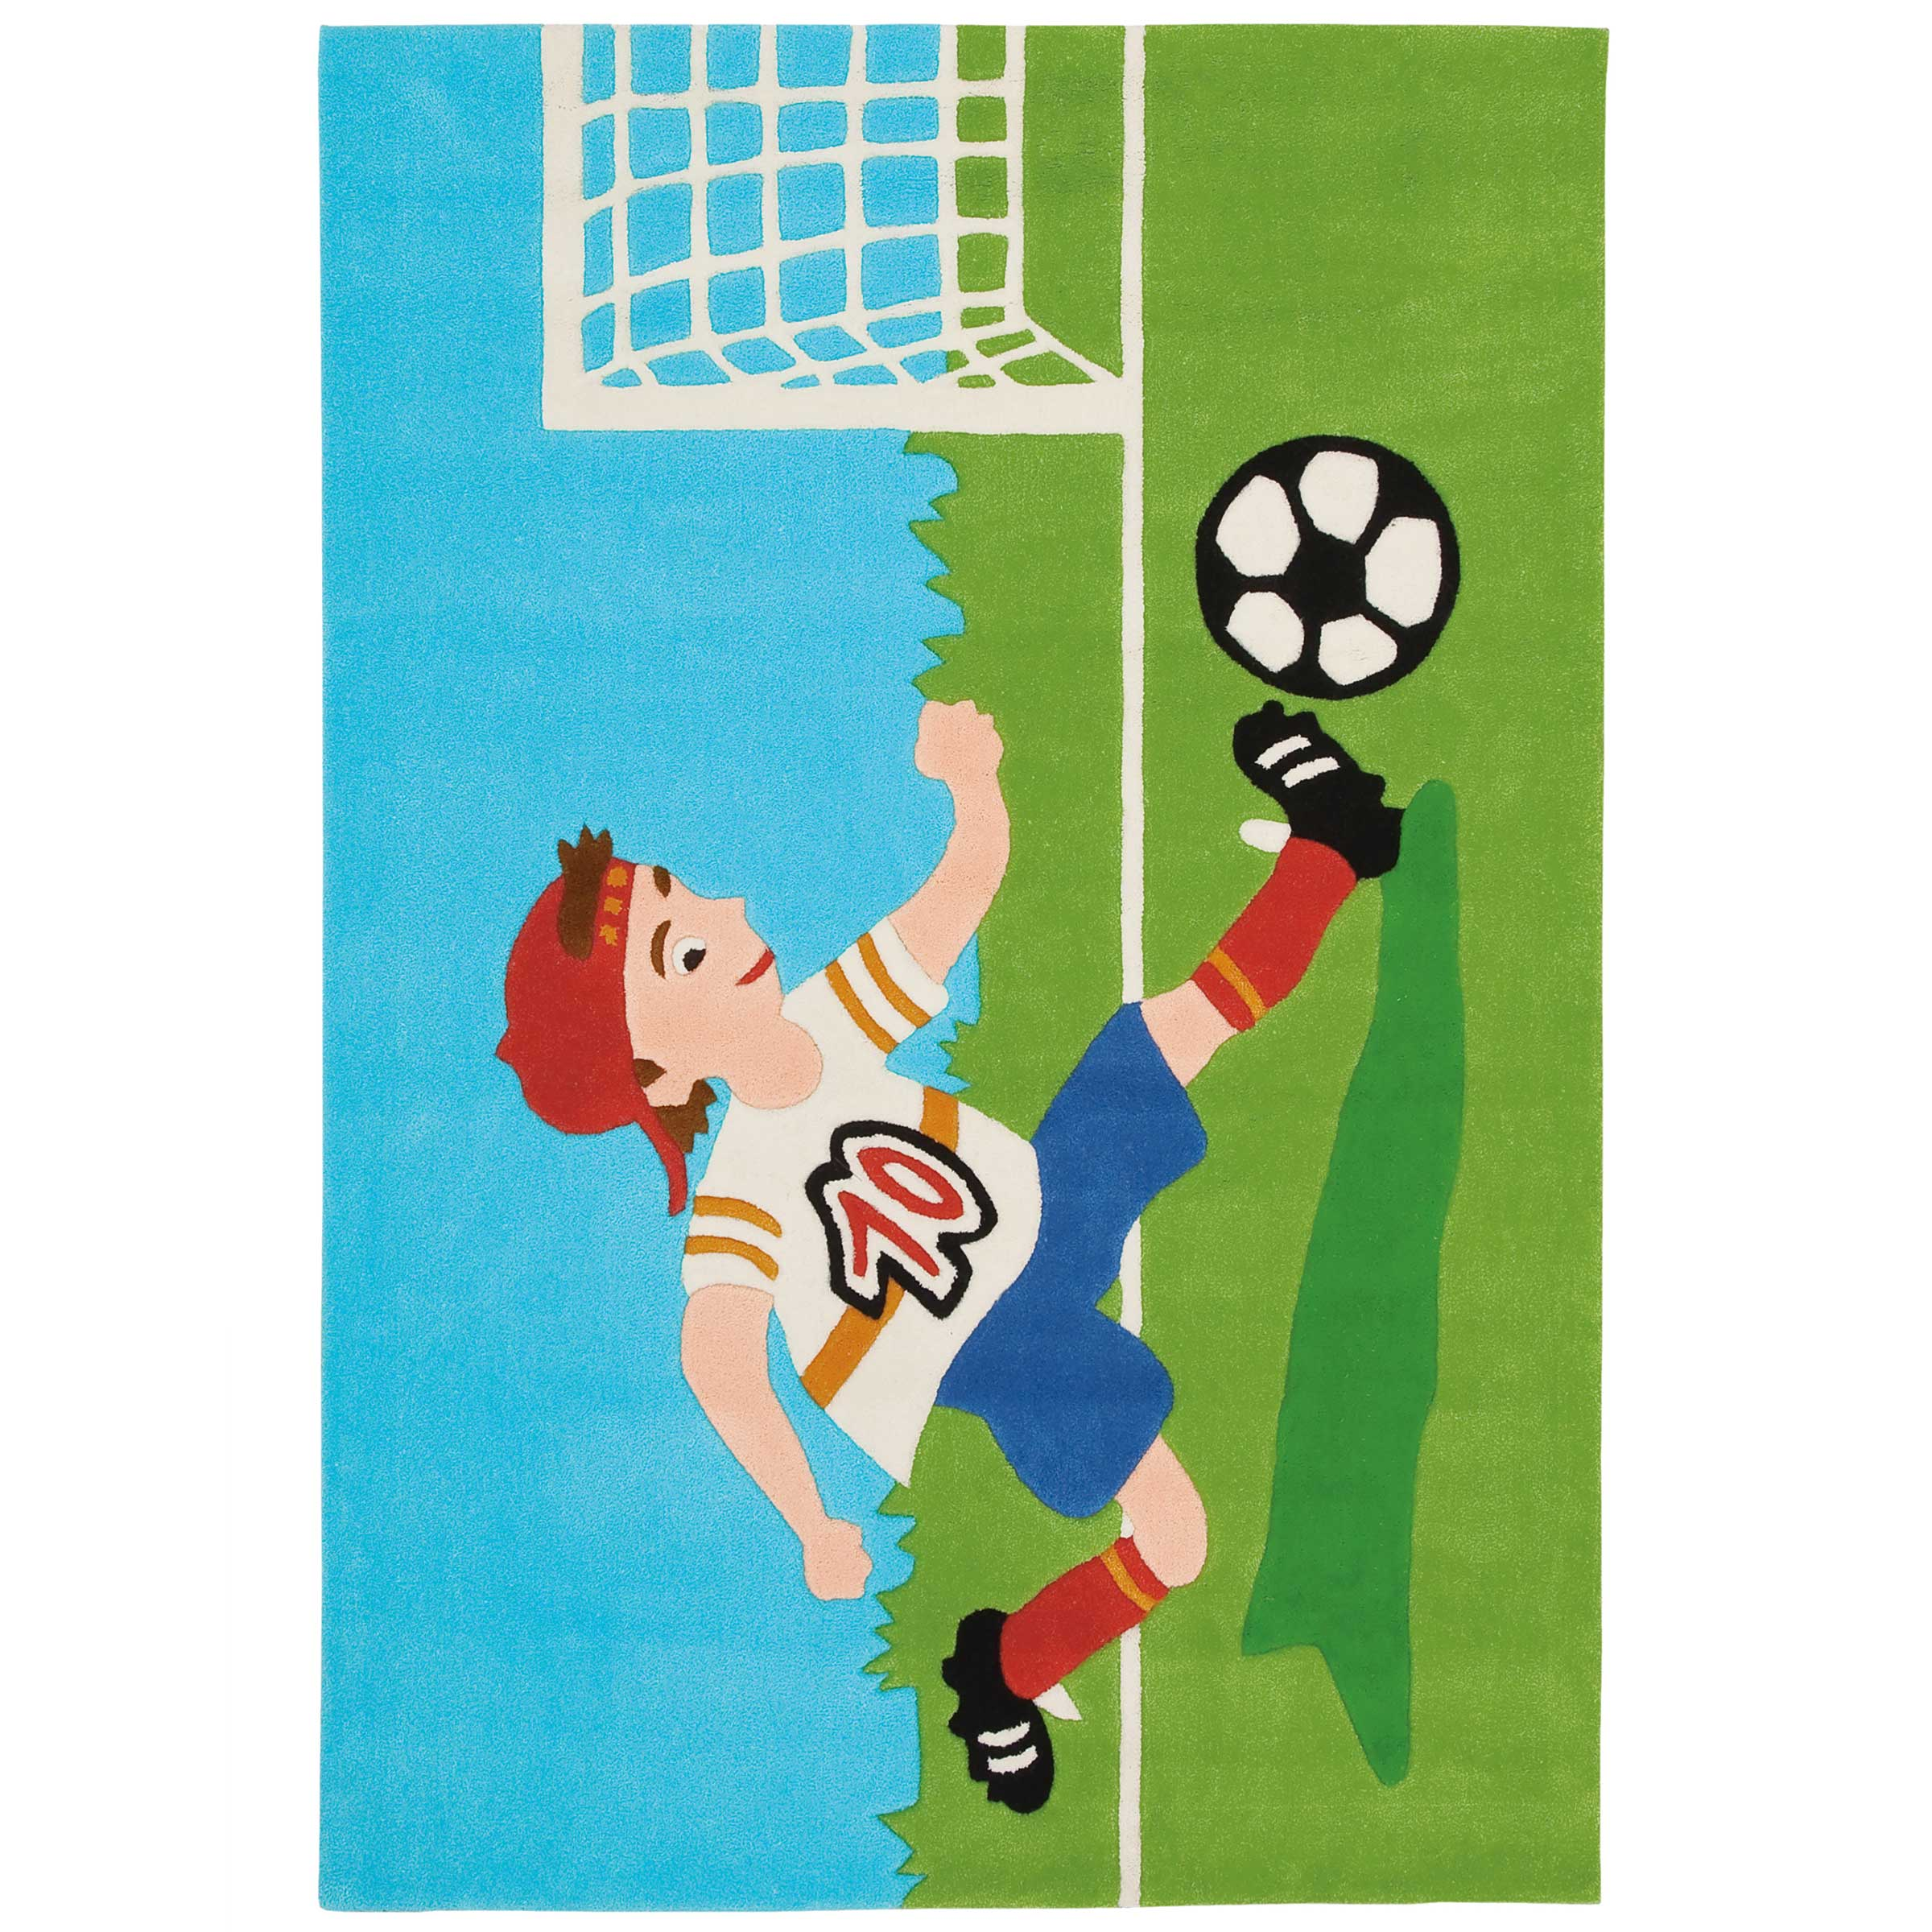 Uitgelezene Voetbal vloerkleed kopen?   Kinderkamer Vloerkleden UL-48